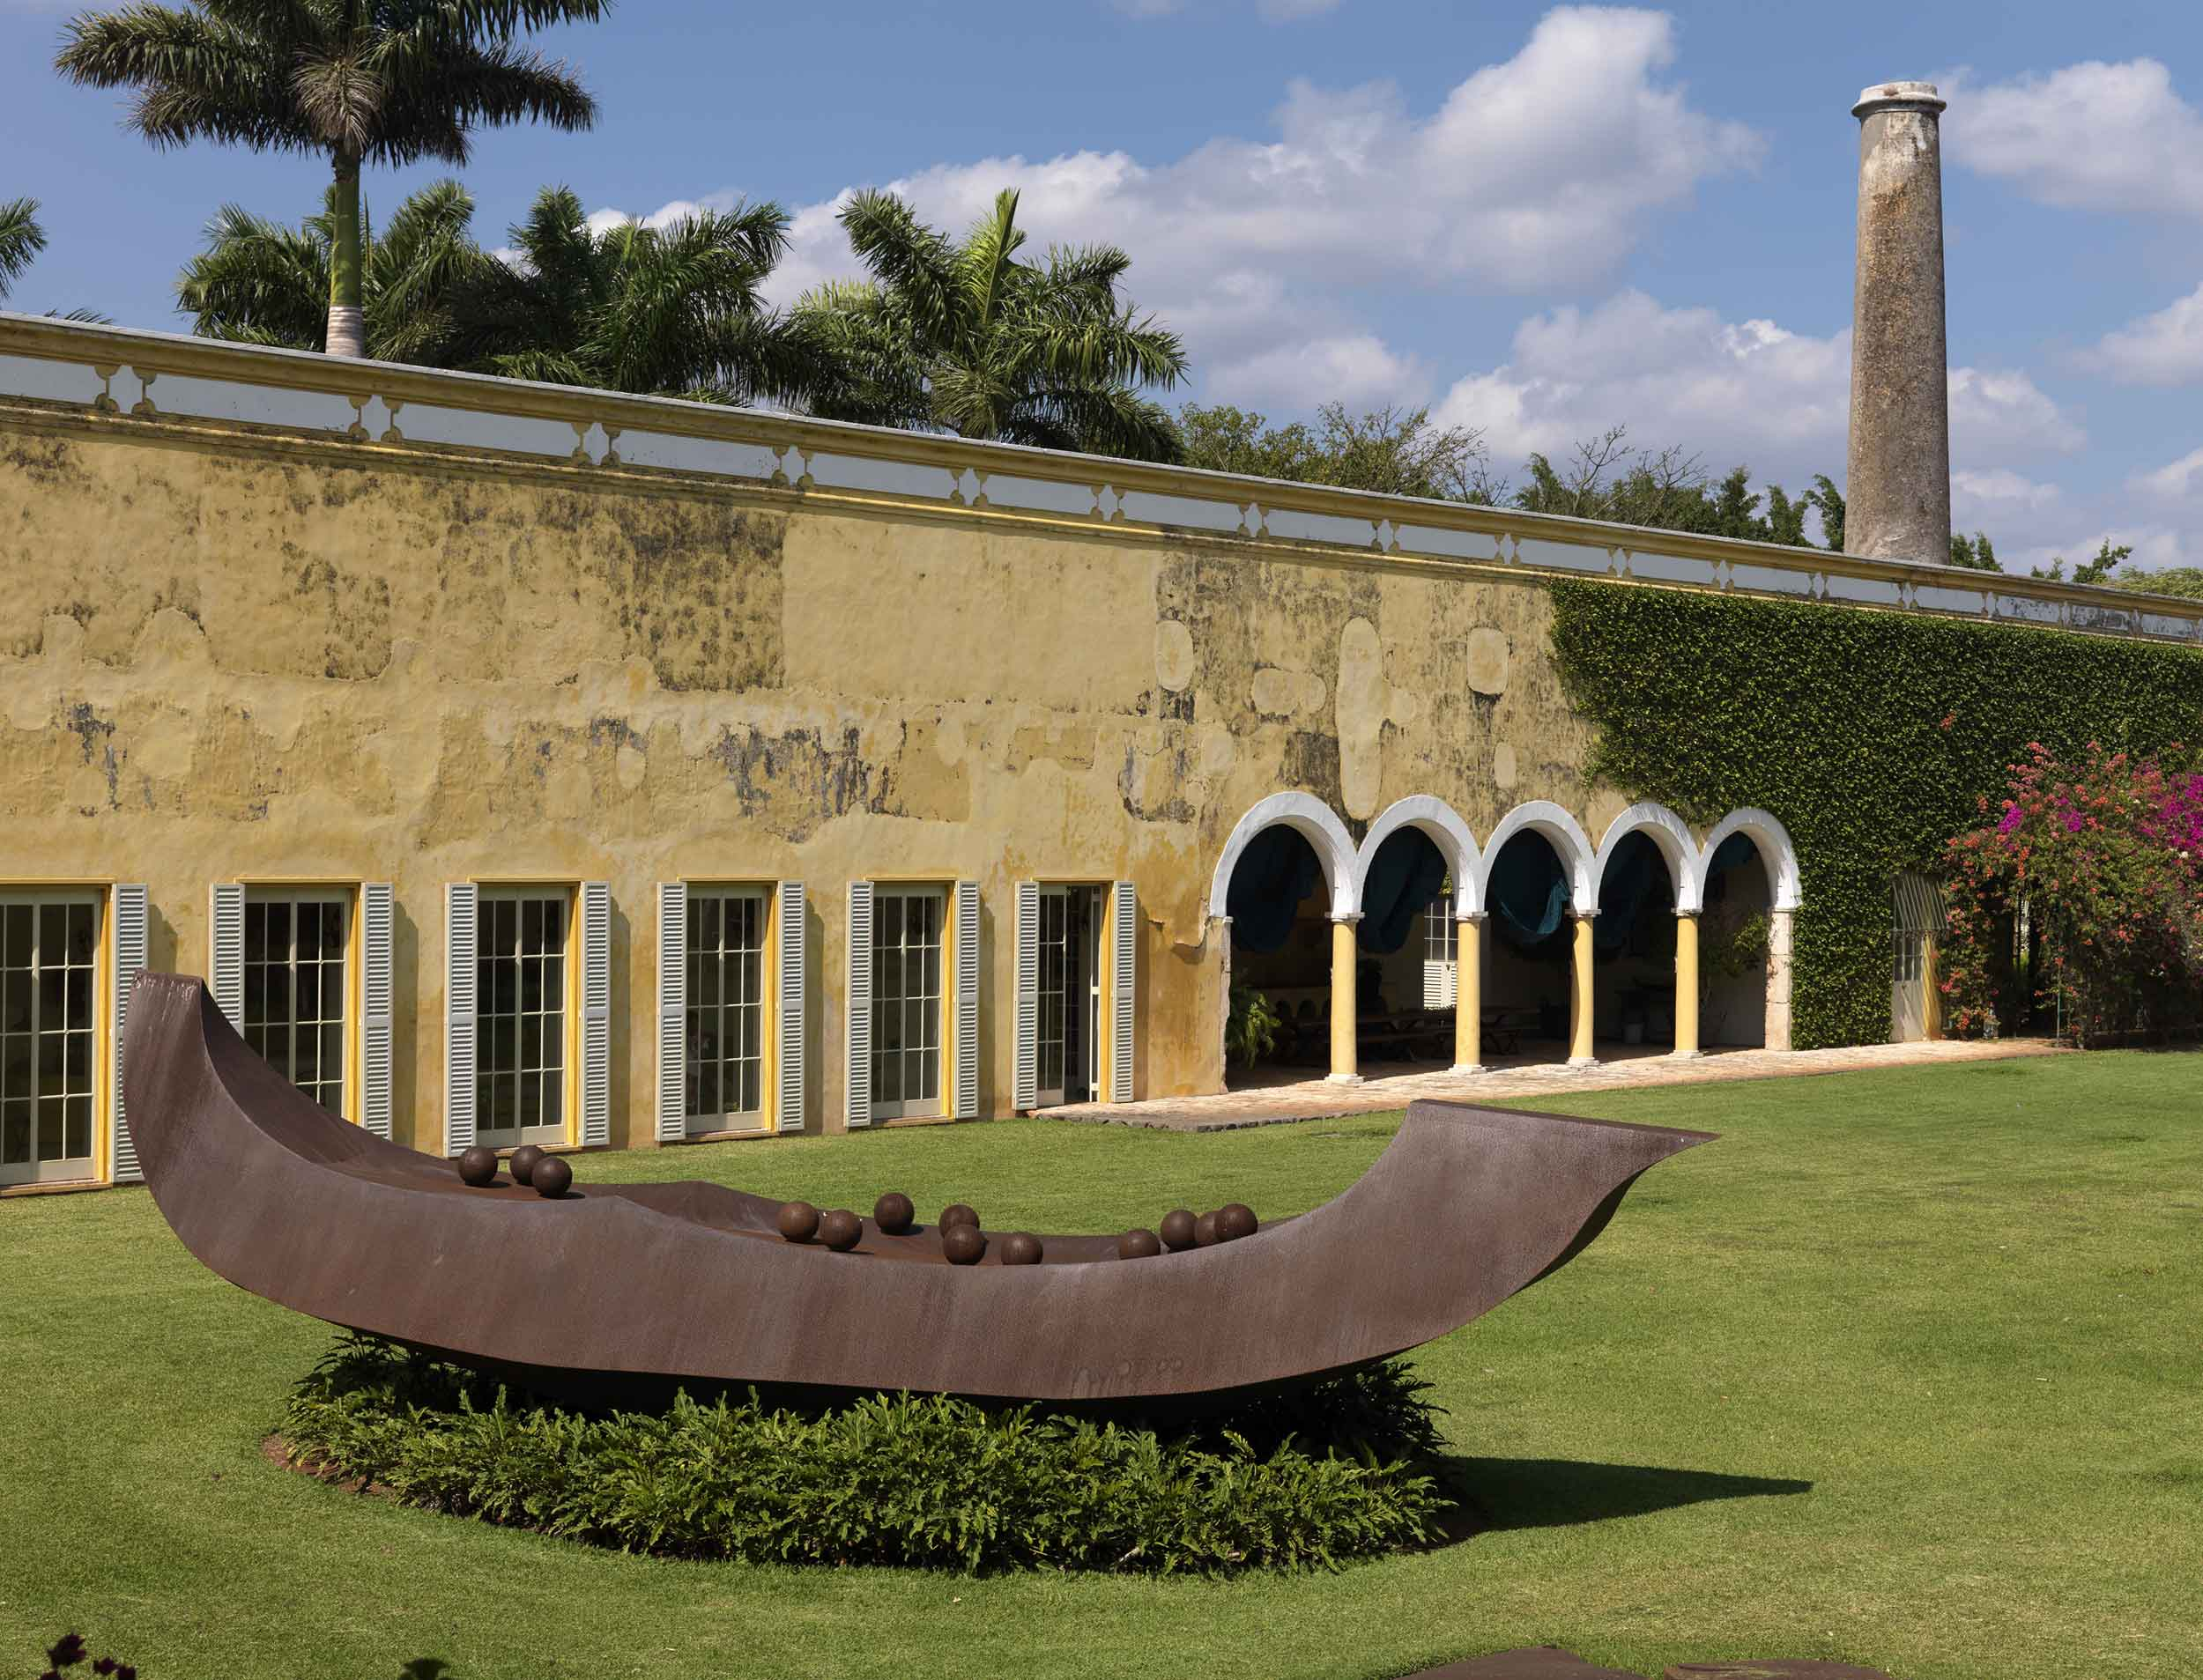 Hacienda San Bernardo, a 19th-century on the Yucatan Peninsula, is rooted in Mexican history.